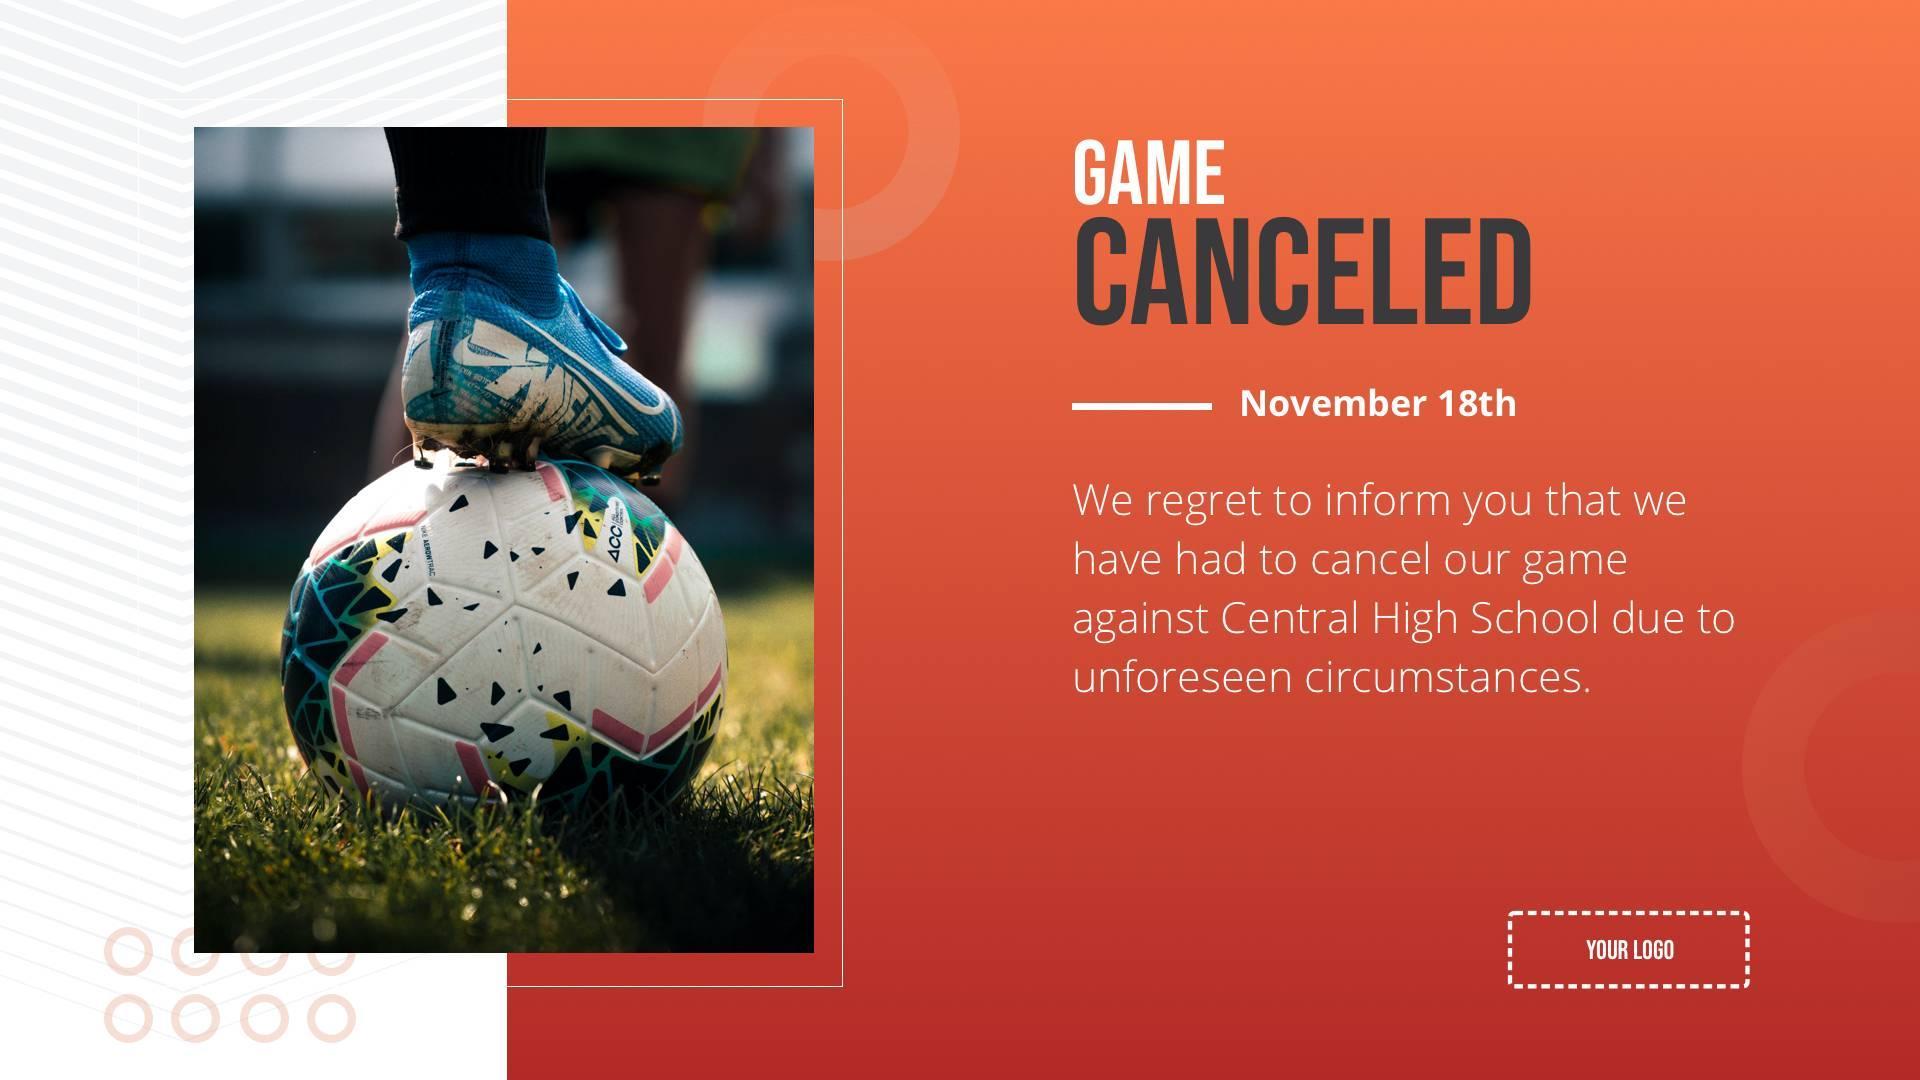 Game Canceled Digital Signage Template